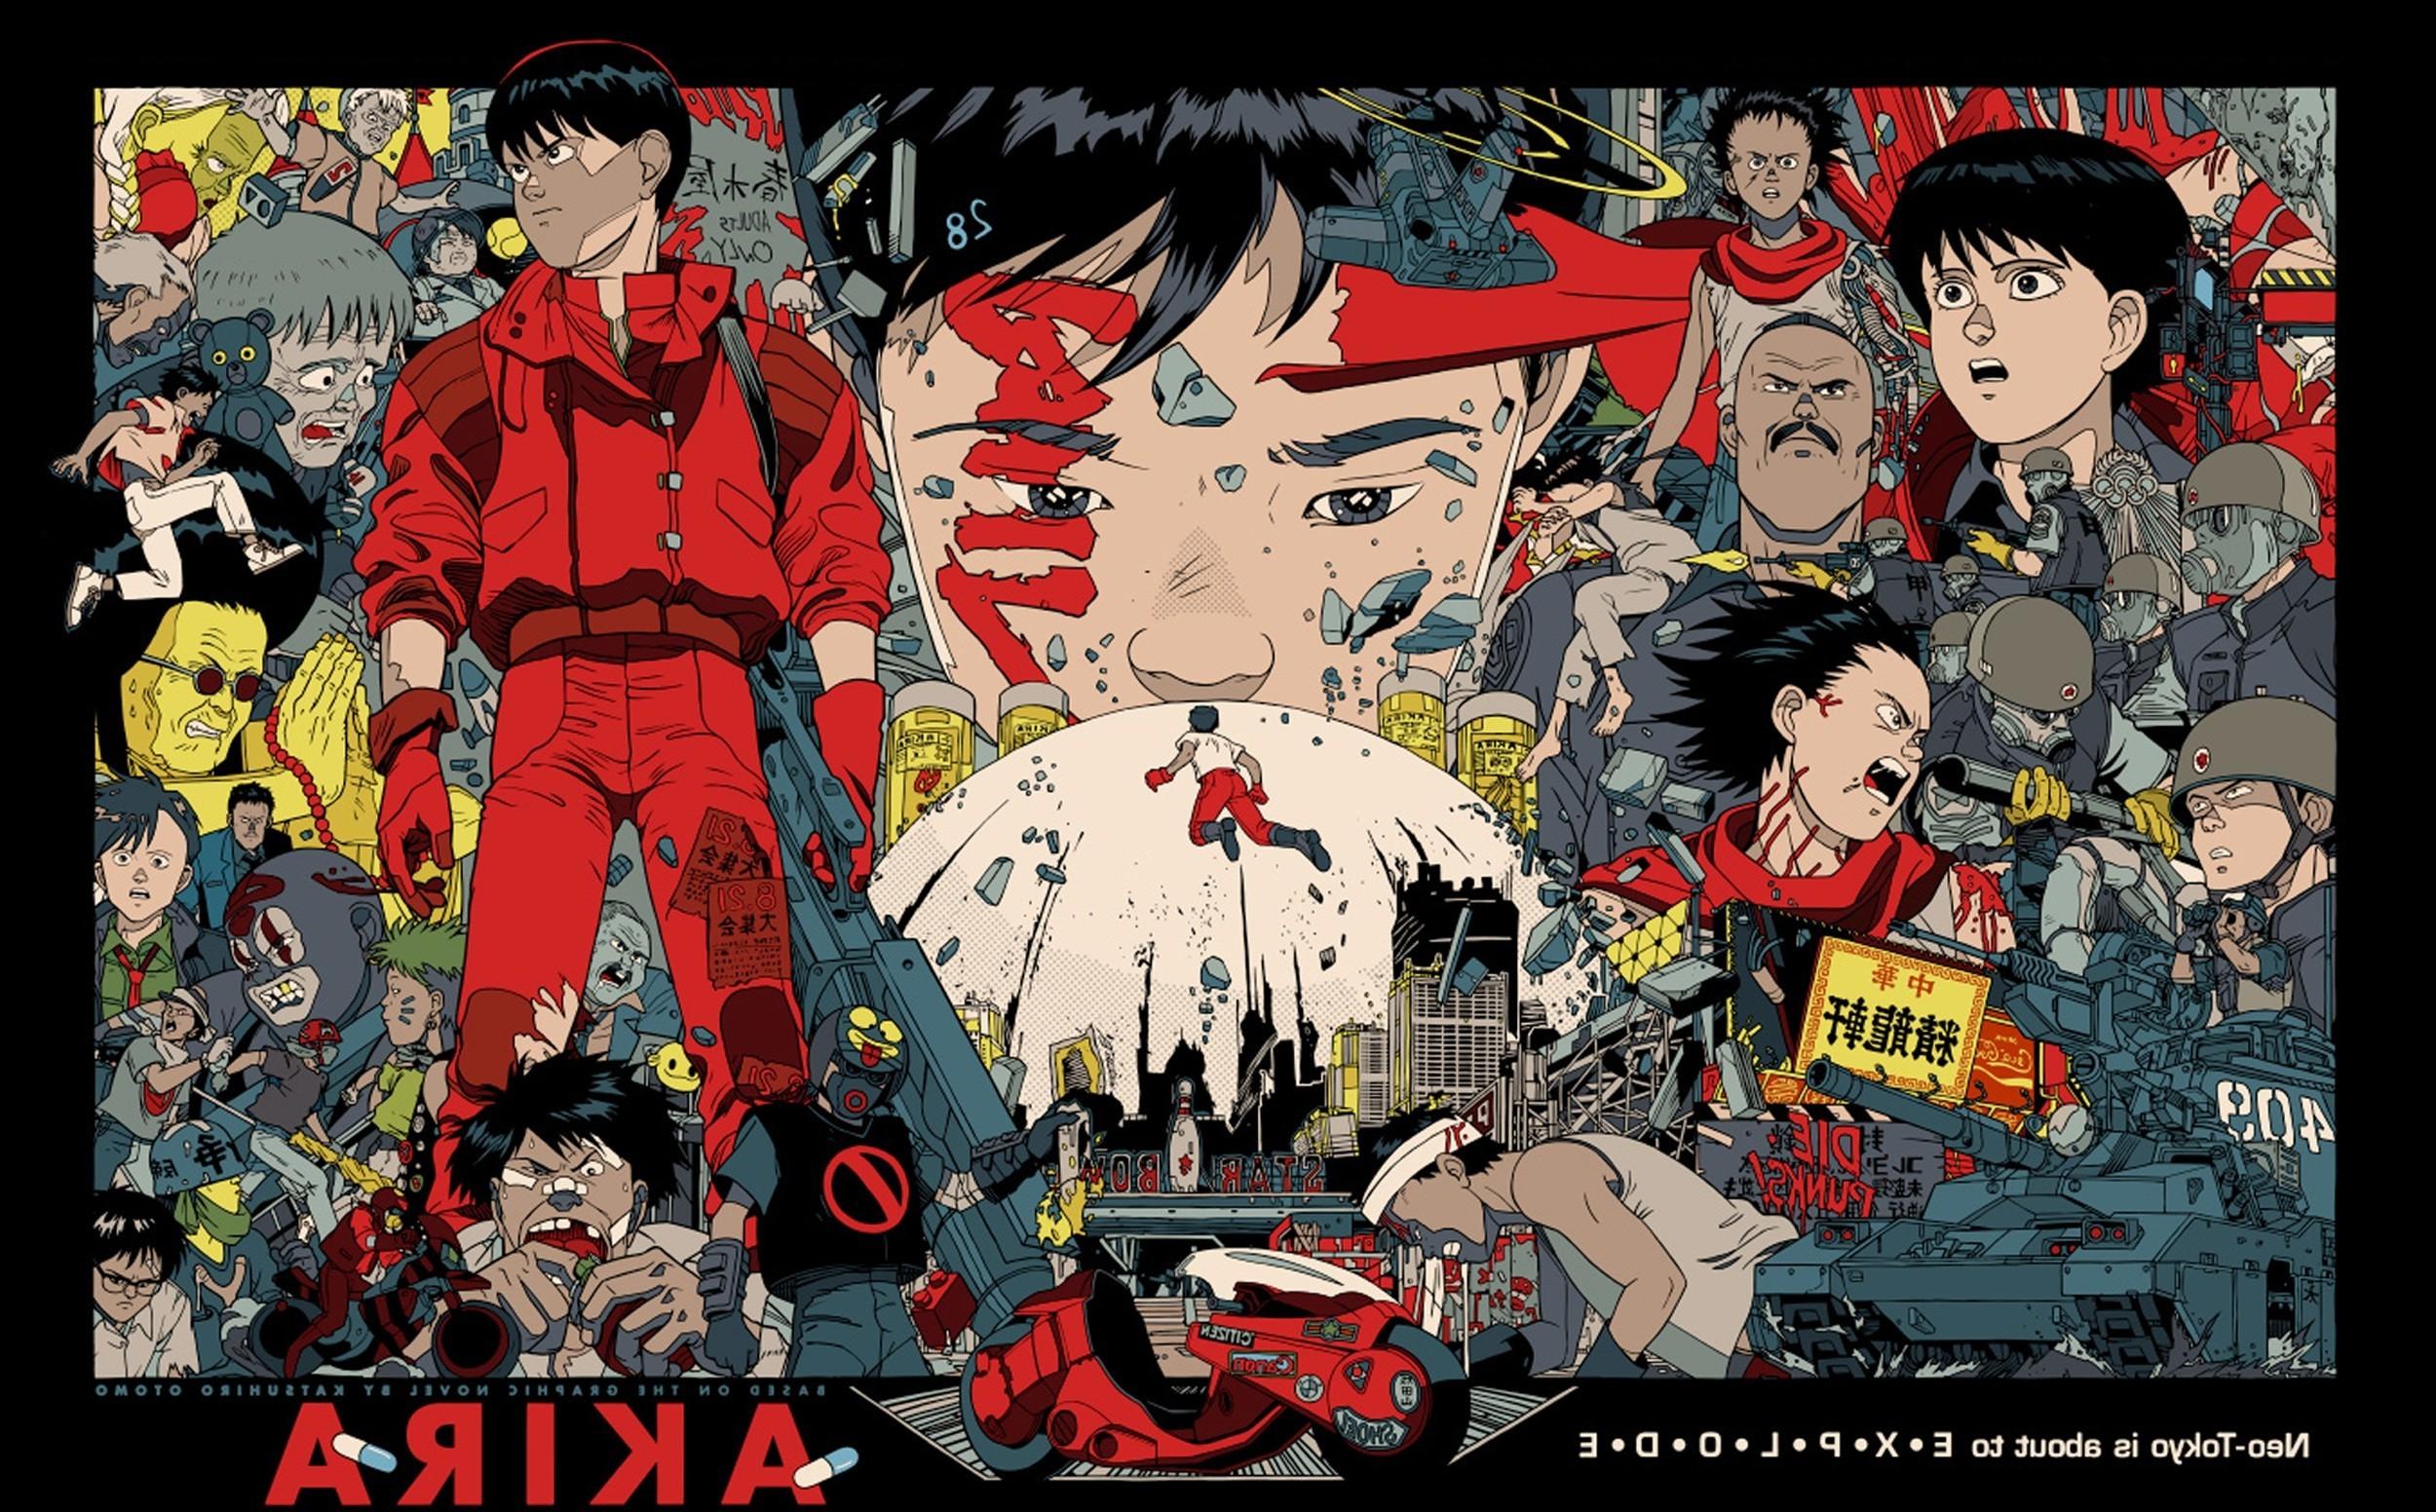 My Hero Academia Wallpaper Iphone X Akira Wallpaper 183 ① Download Free Hd Wallpapers For Desktop